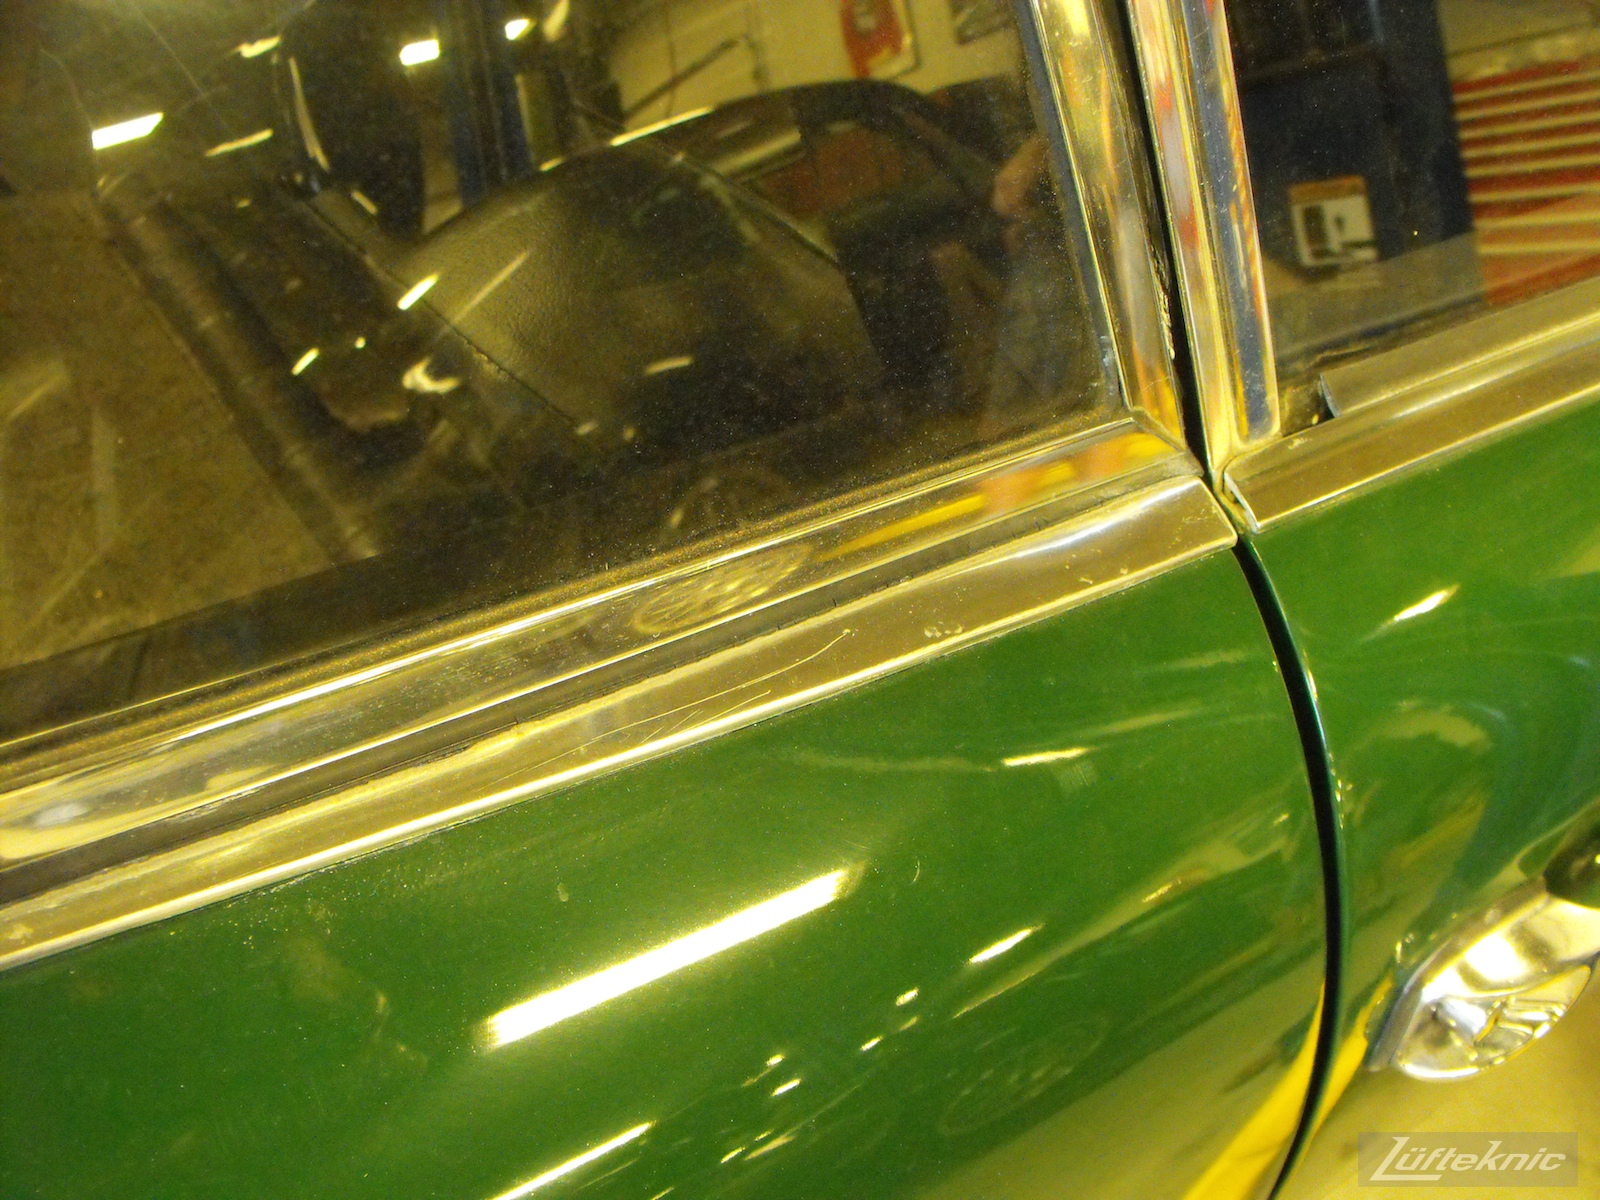 An Irish Green Porsche 912 undergoing restoration at Lufteknic.